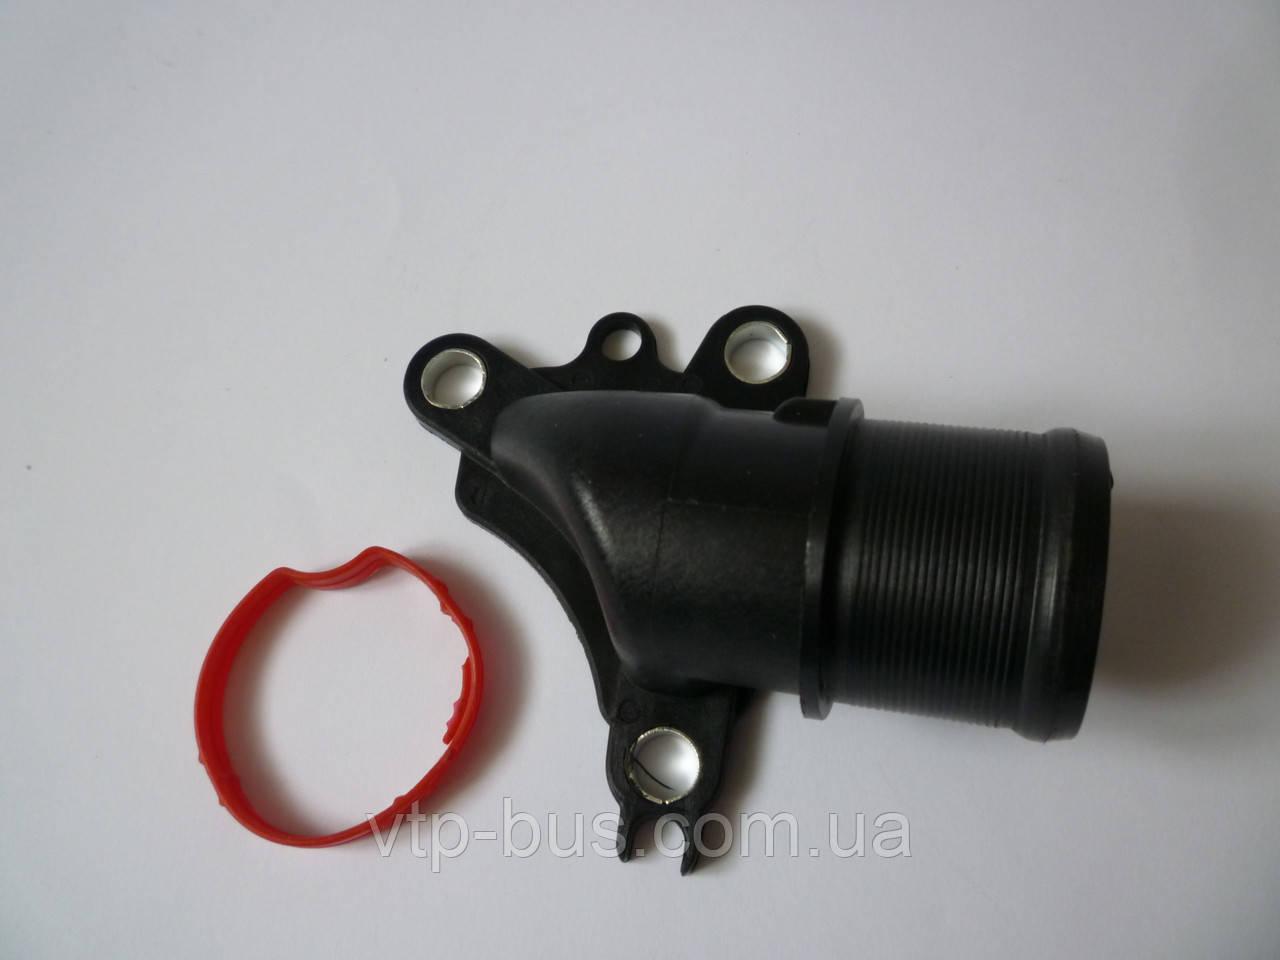 Патрубок масляного охладителя на Renault Trafic 2.0 dCi с 2006... Metalcaucho (Испания,) MC03924